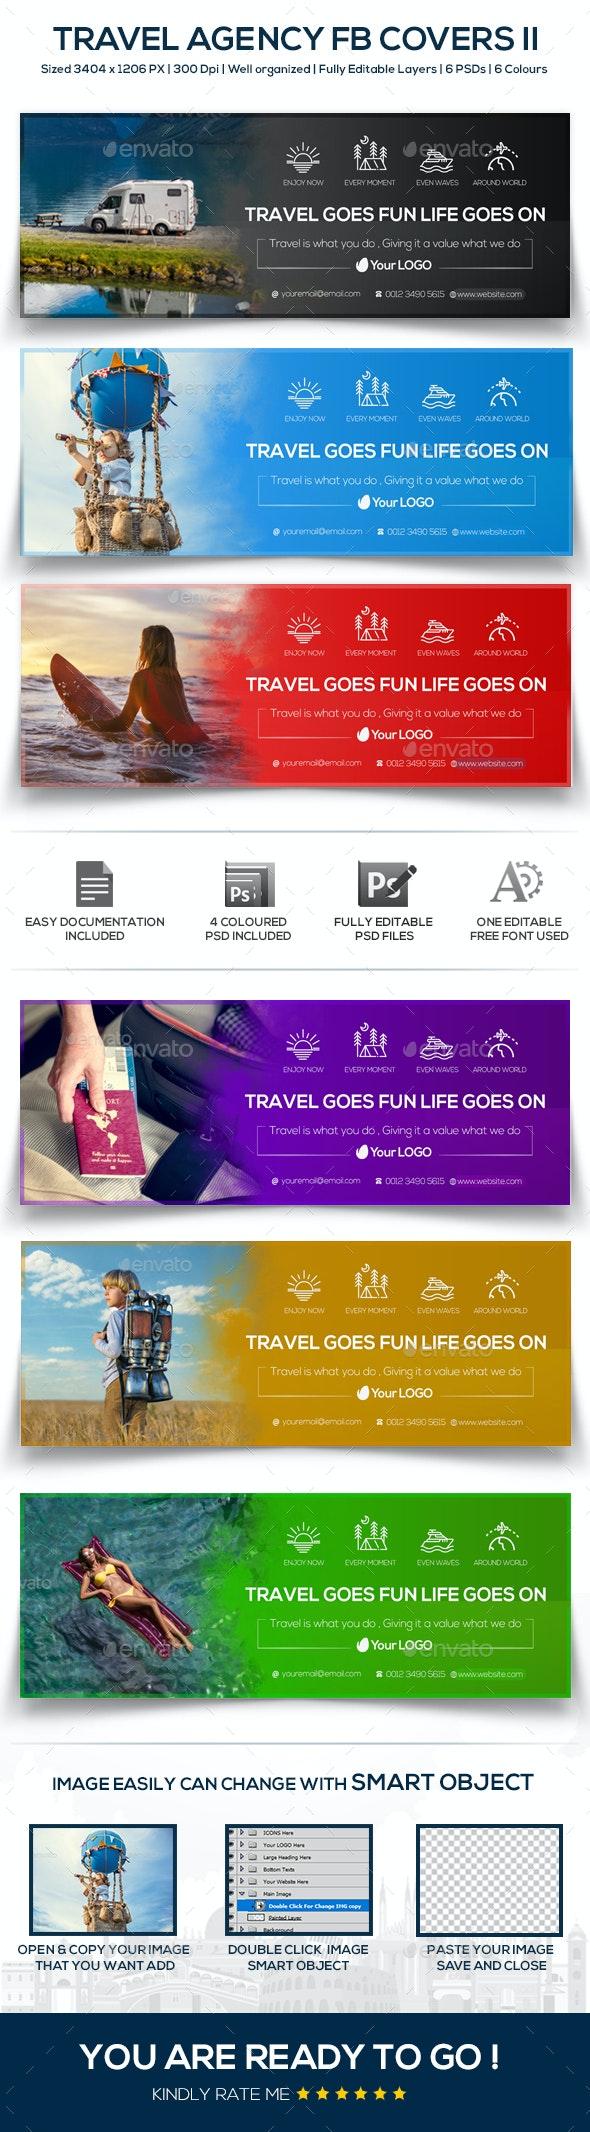 Travel Agency Facebook Covers II - Facebook Timeline Covers Social Media